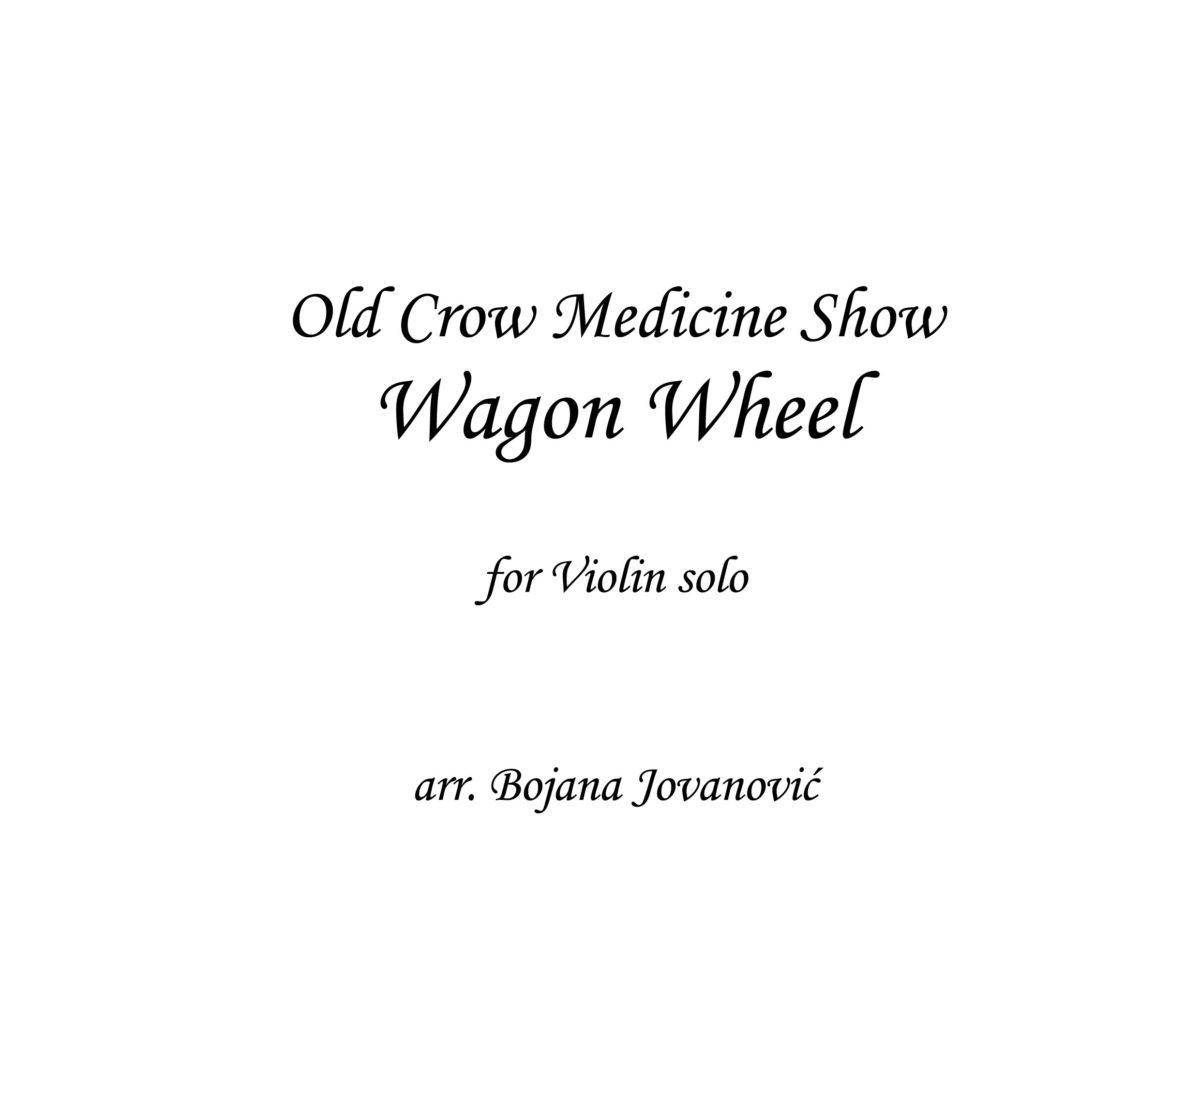 Wagon Wheel (Old Crow Medicine Show) Sheet music